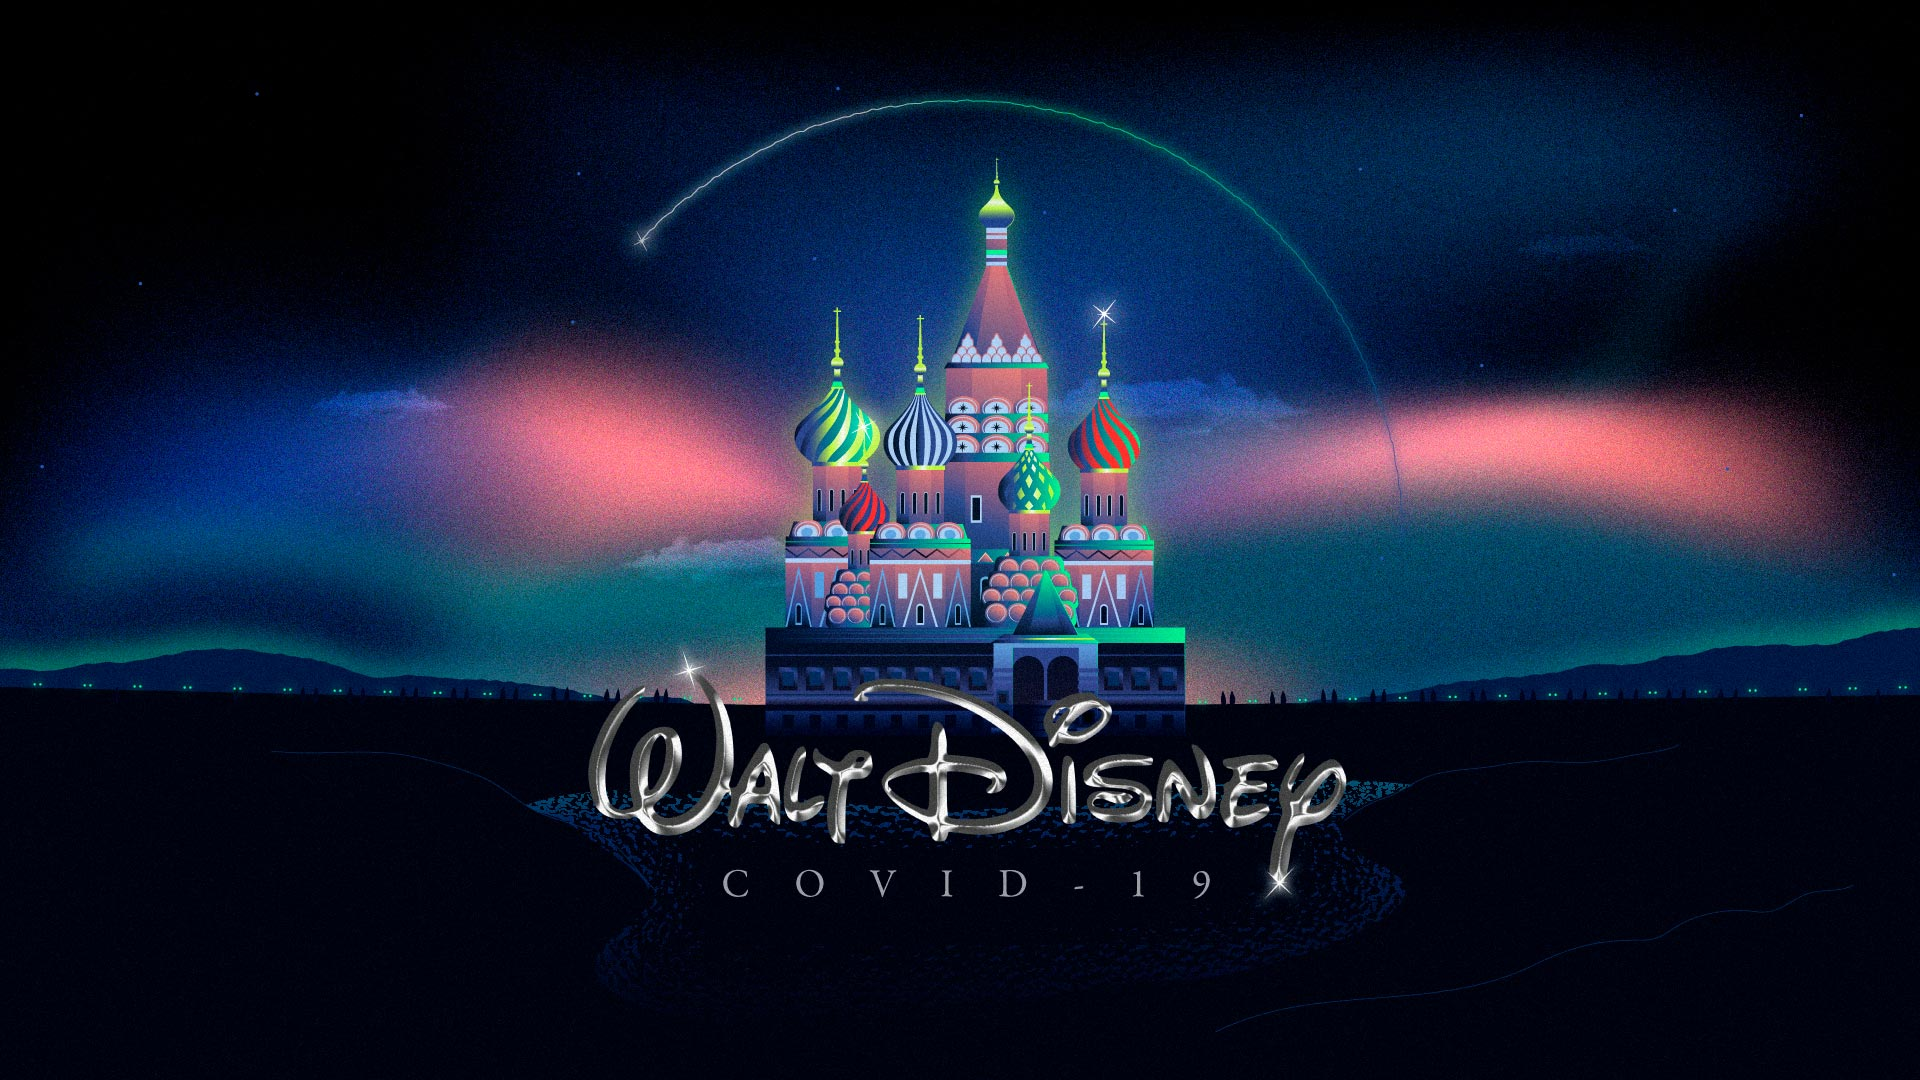 Conociendo-Rusia-con-dibujos-animados_01Port